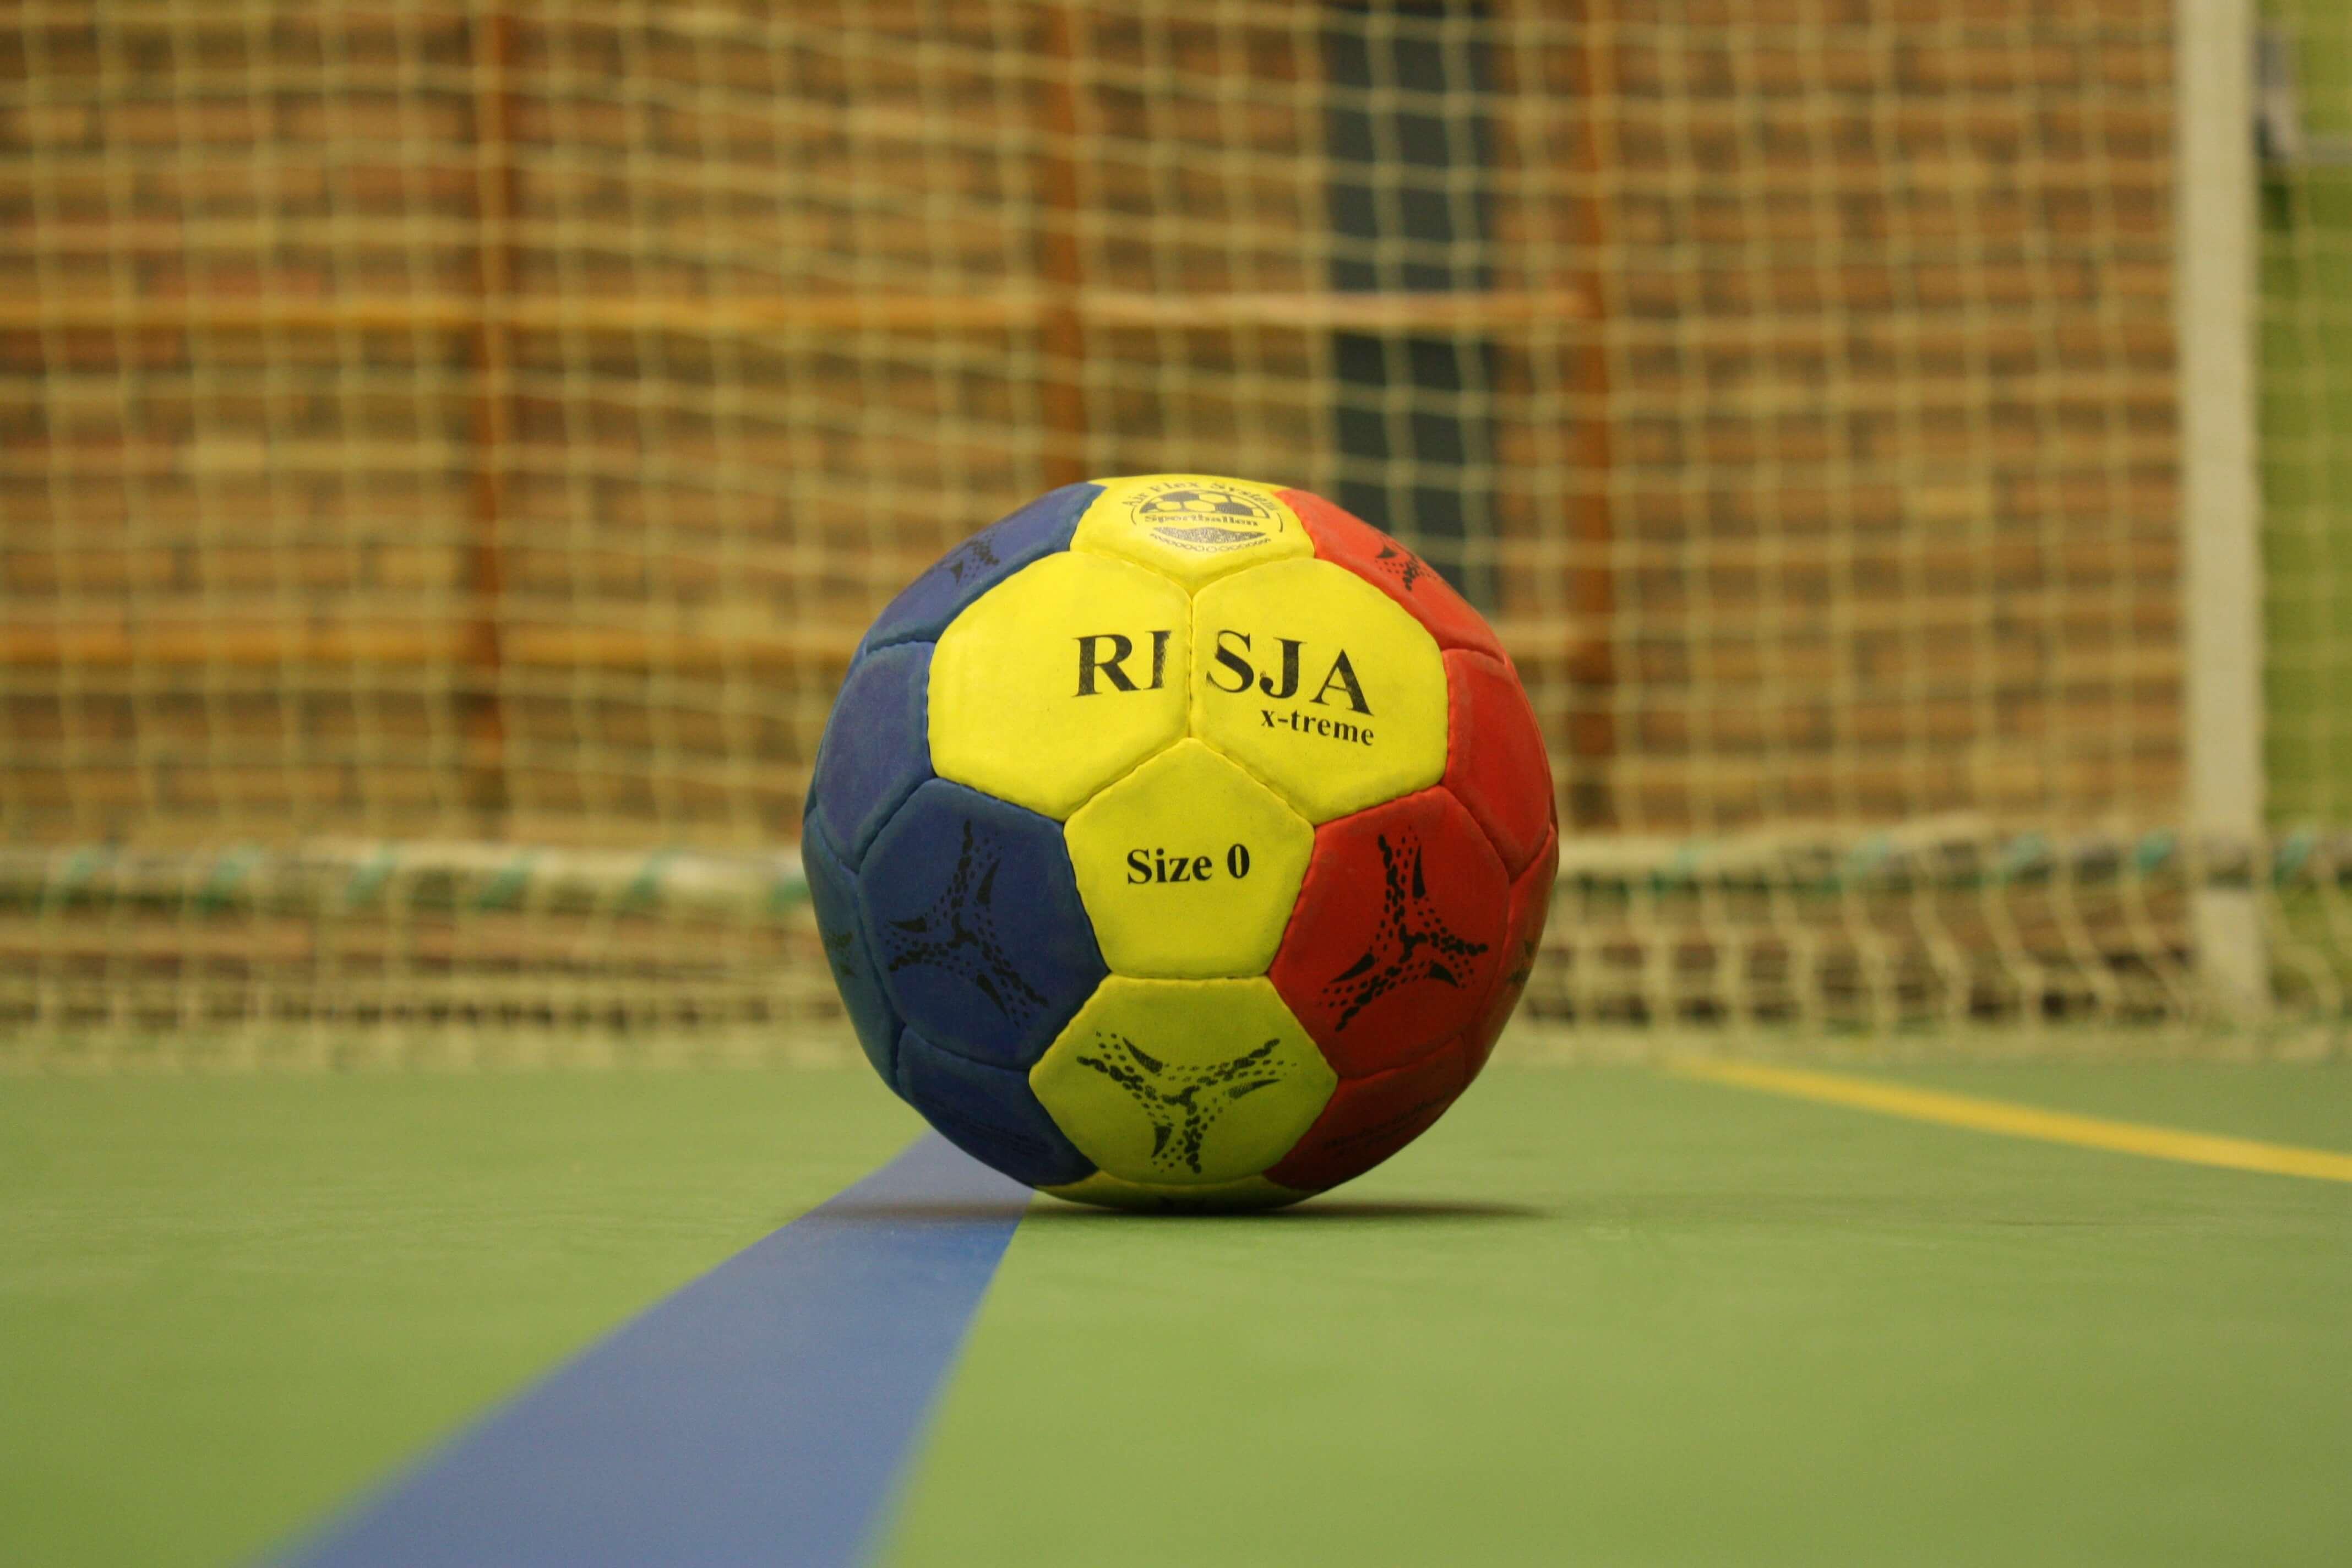 Risja Sportballen